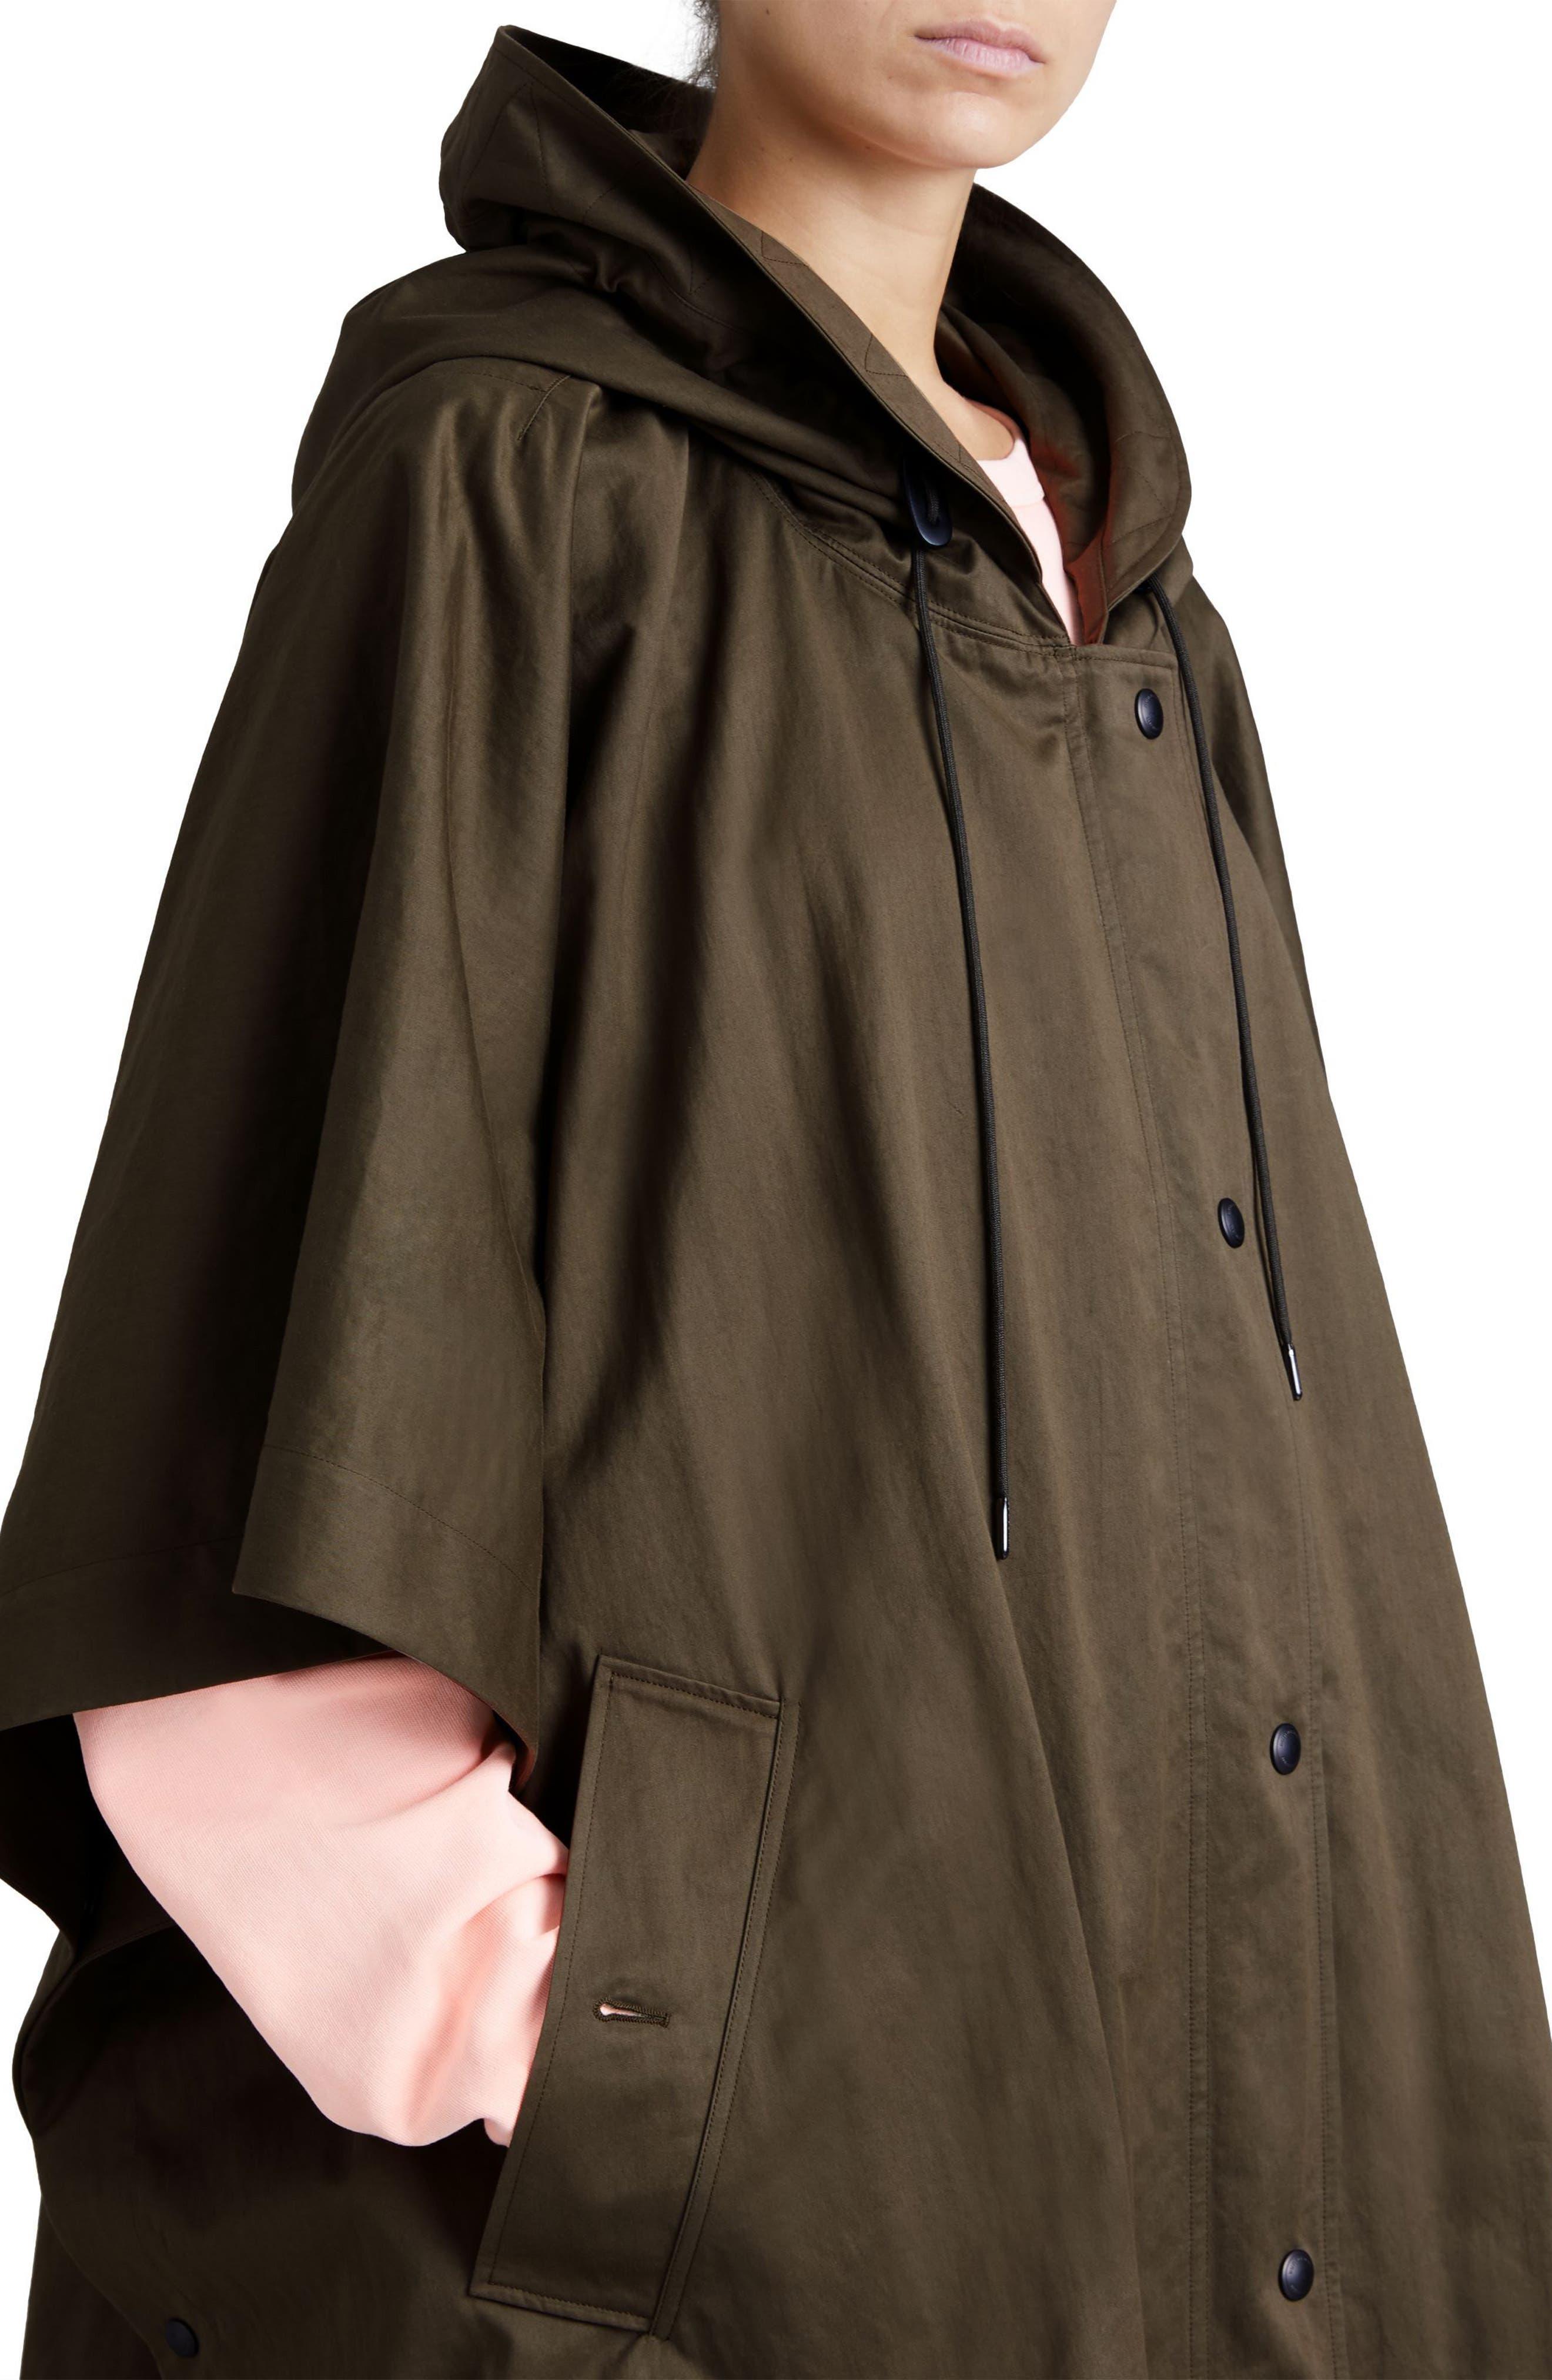 Samdale Swing Coat,                             Alternate thumbnail 6, color,                             Dark Olive